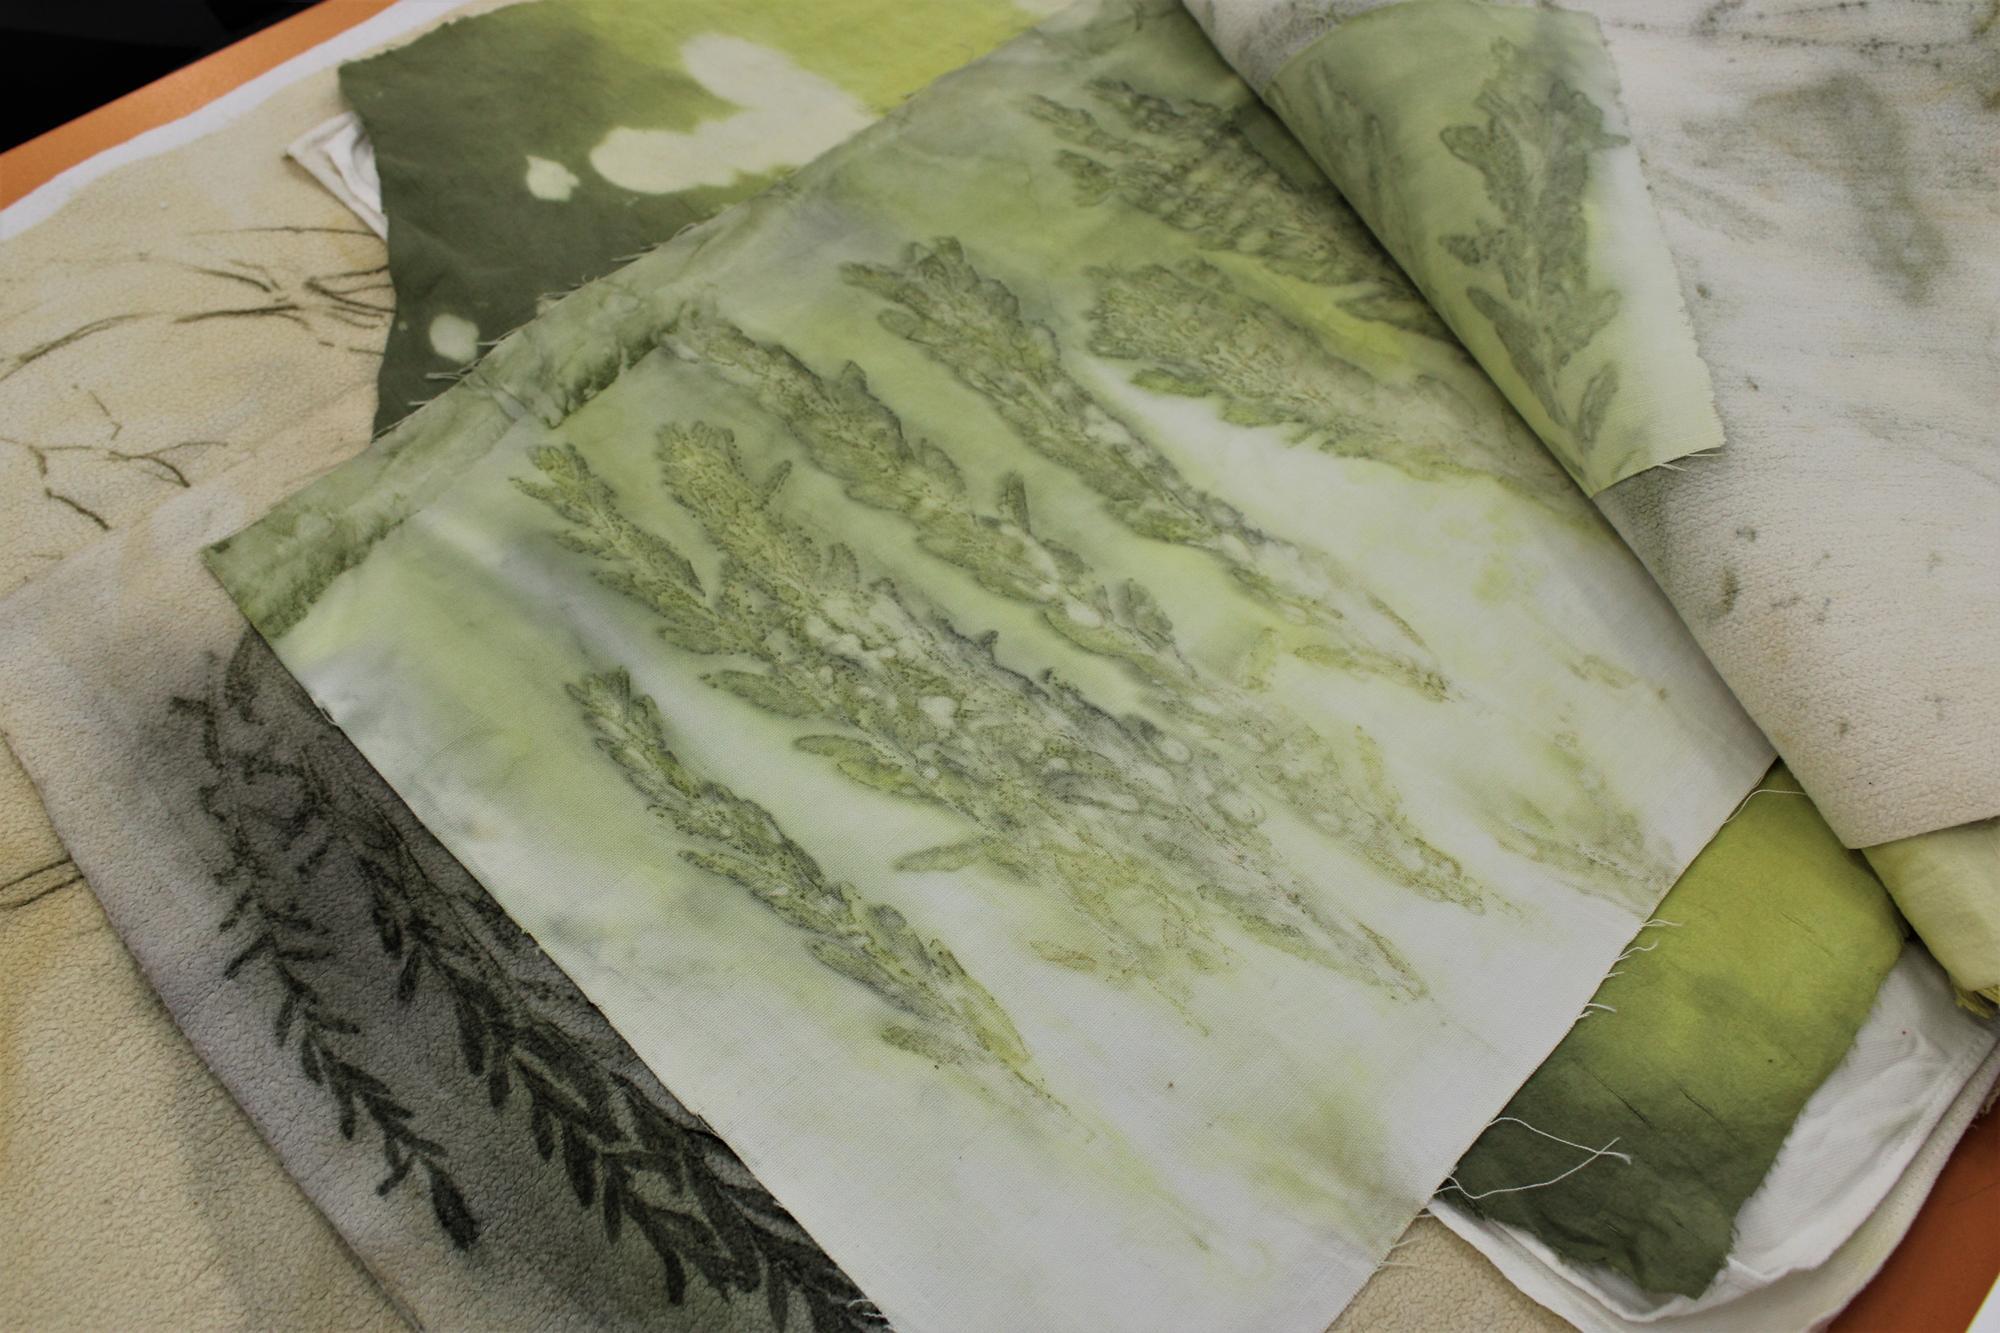 пофарбована рослинами тканина